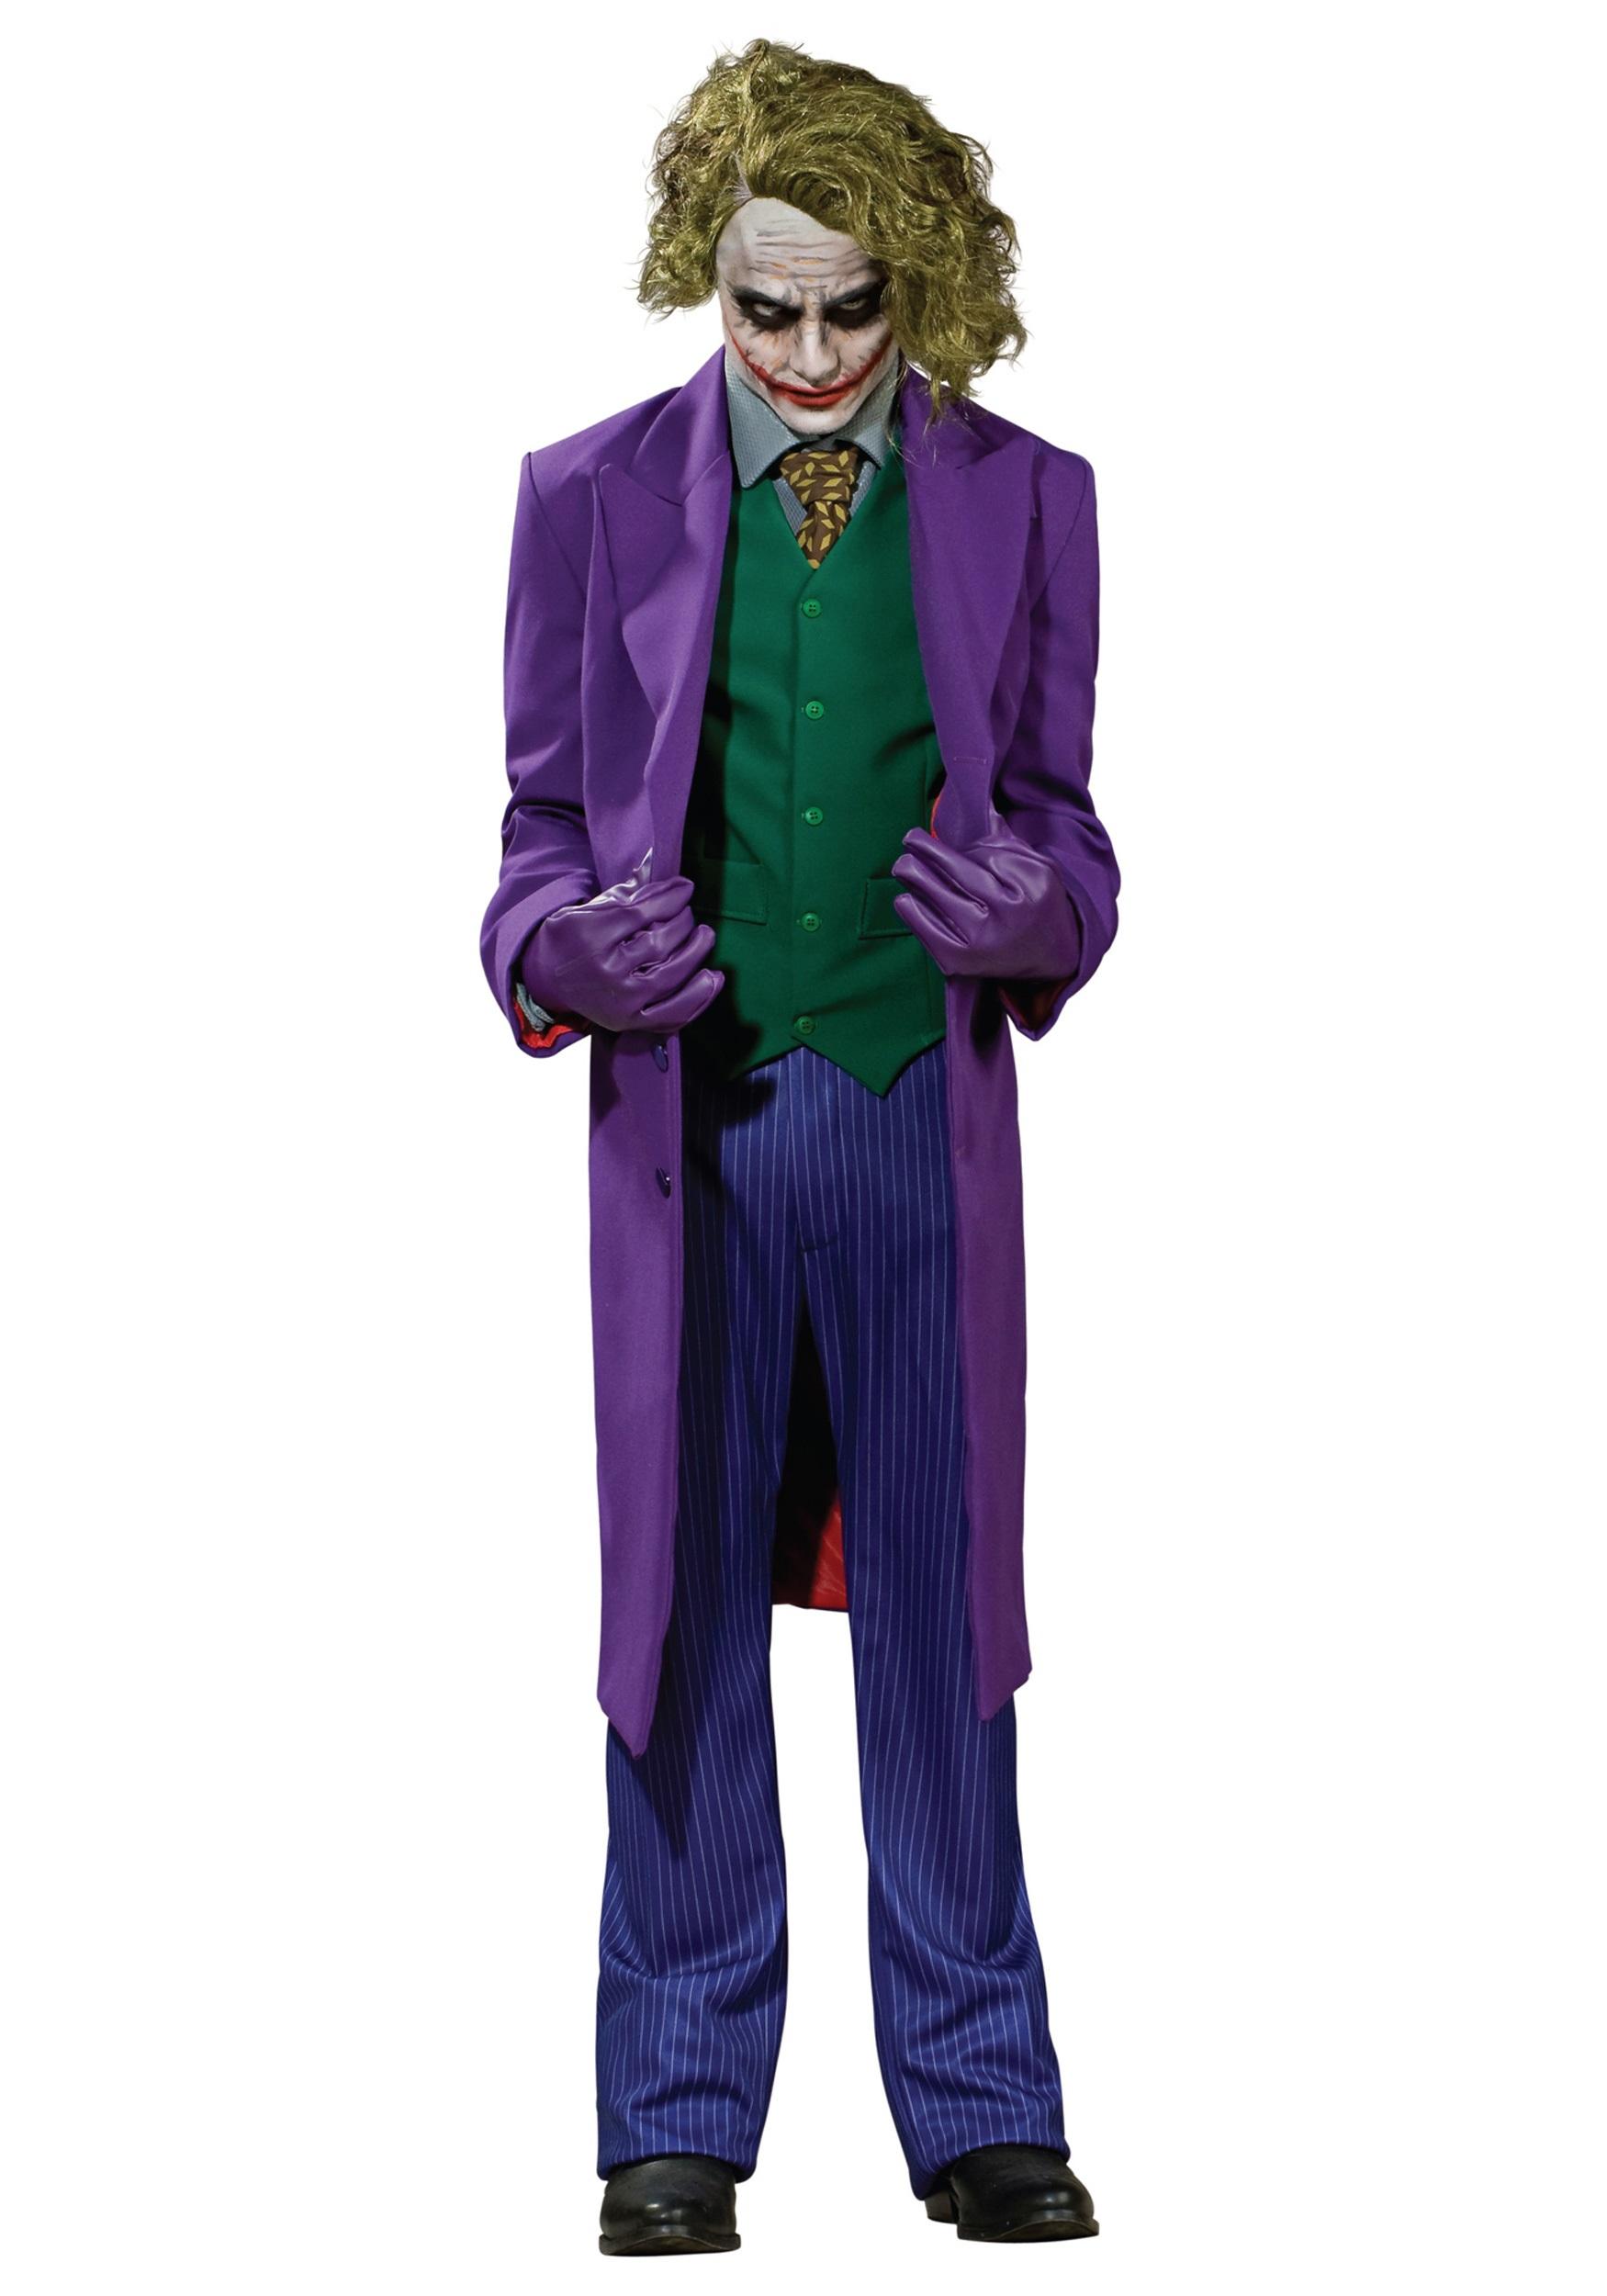 Grand Heritage Joker Costume  sc 1 st  Halloween Costumes & Grand Heritage Joker Costume - Halloween Costumes